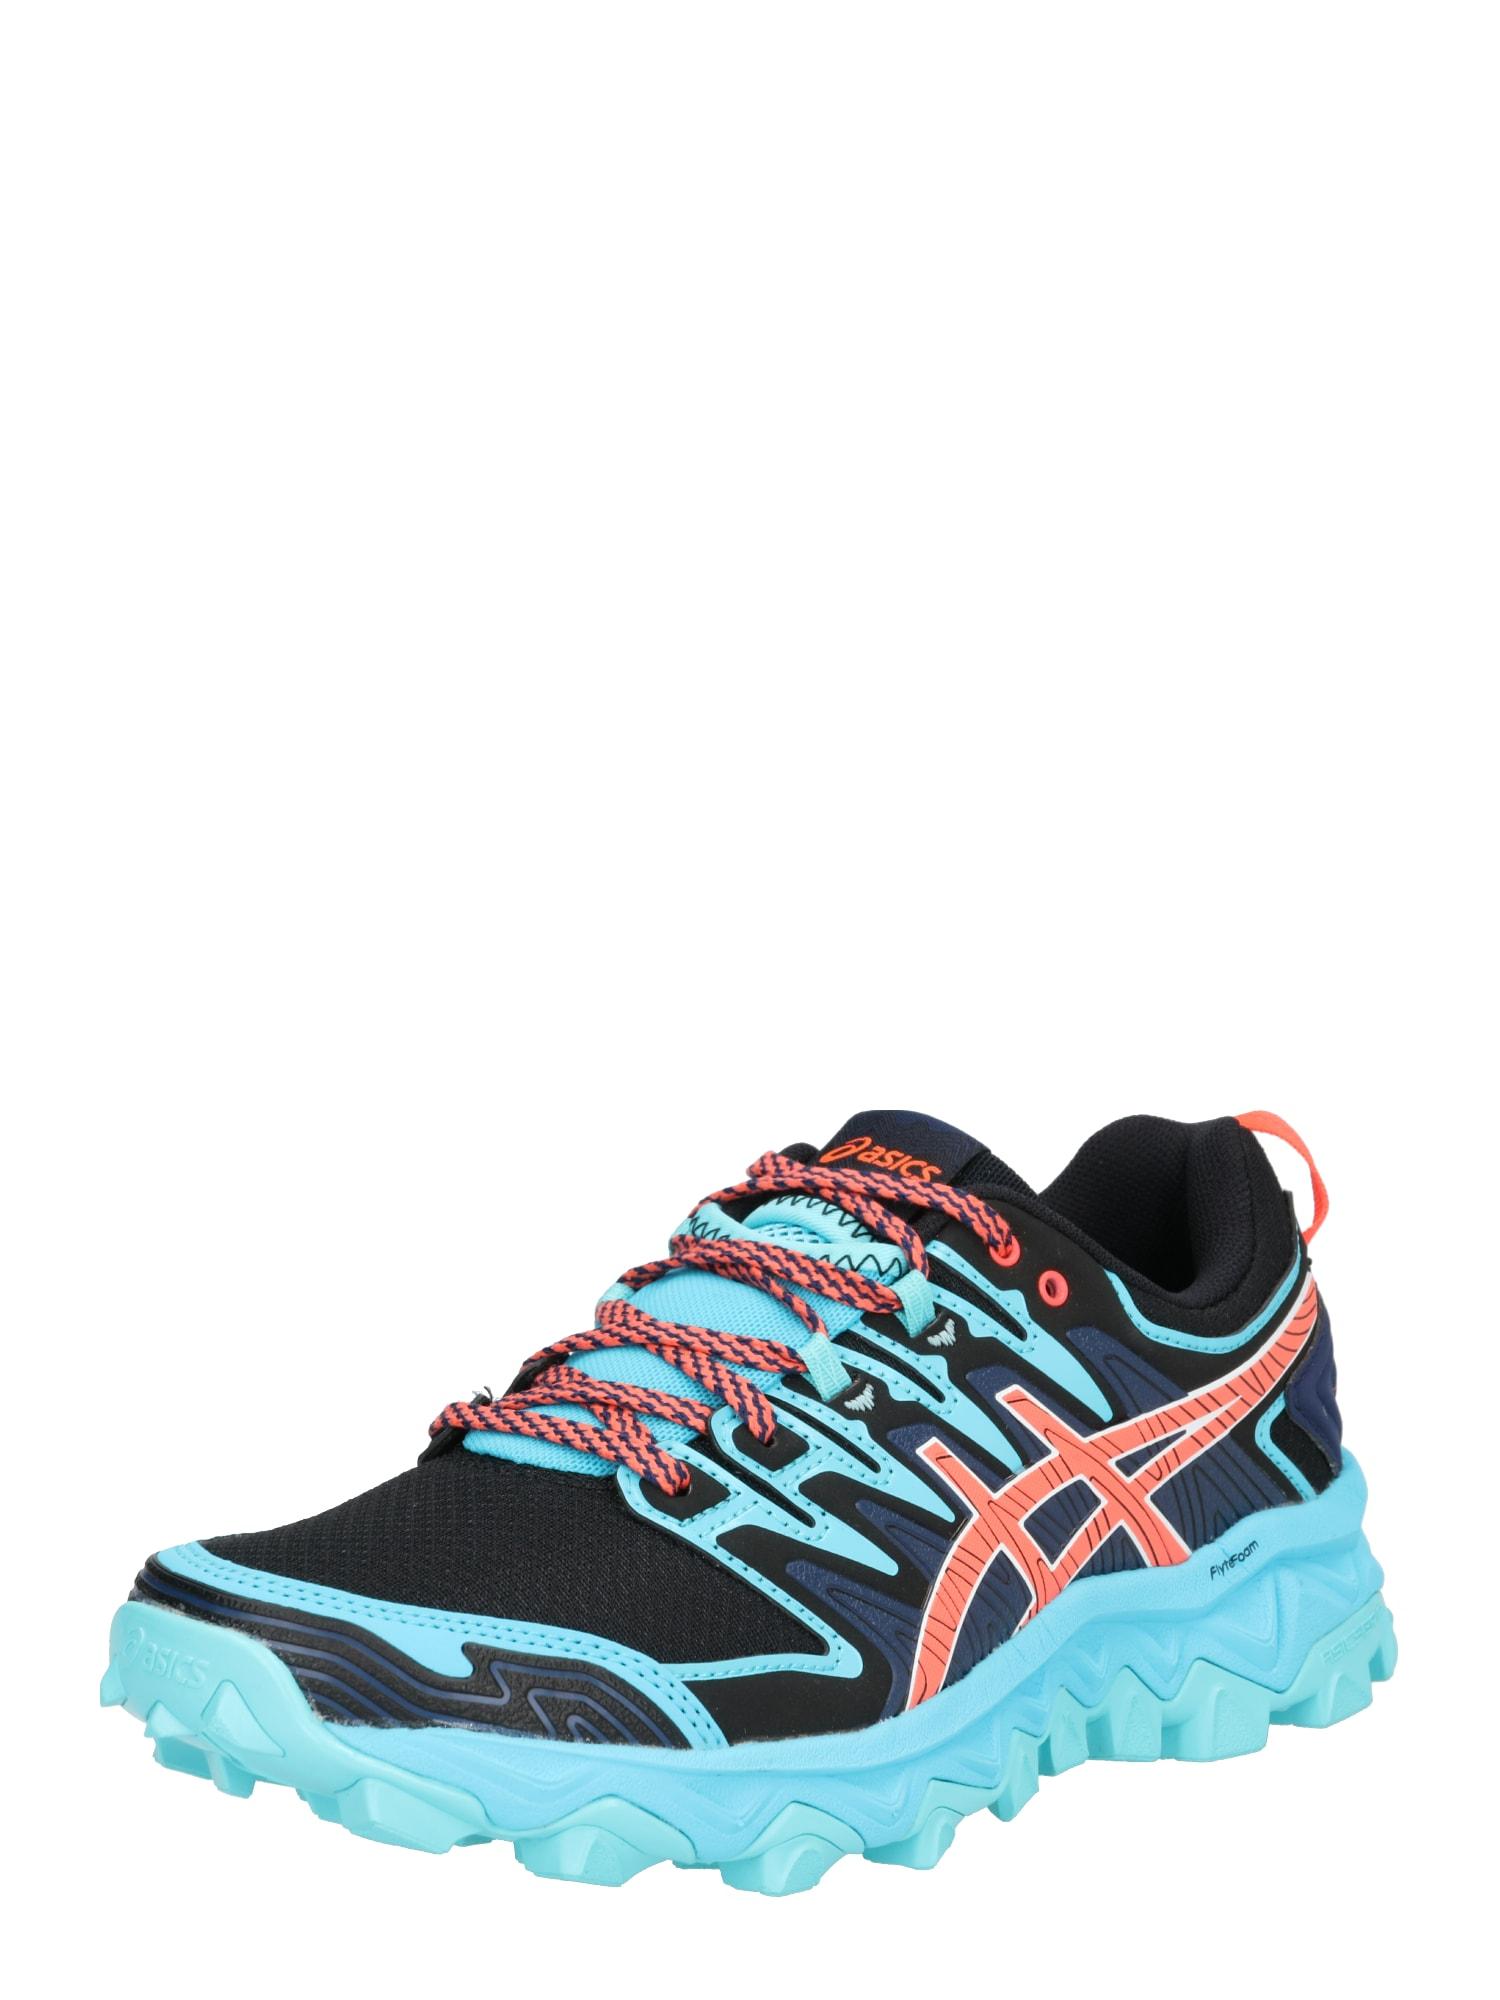 Běžecká obuv Gel-Fujitrabuco 7 aqua modrá tmavě modrá oranžová ASICS